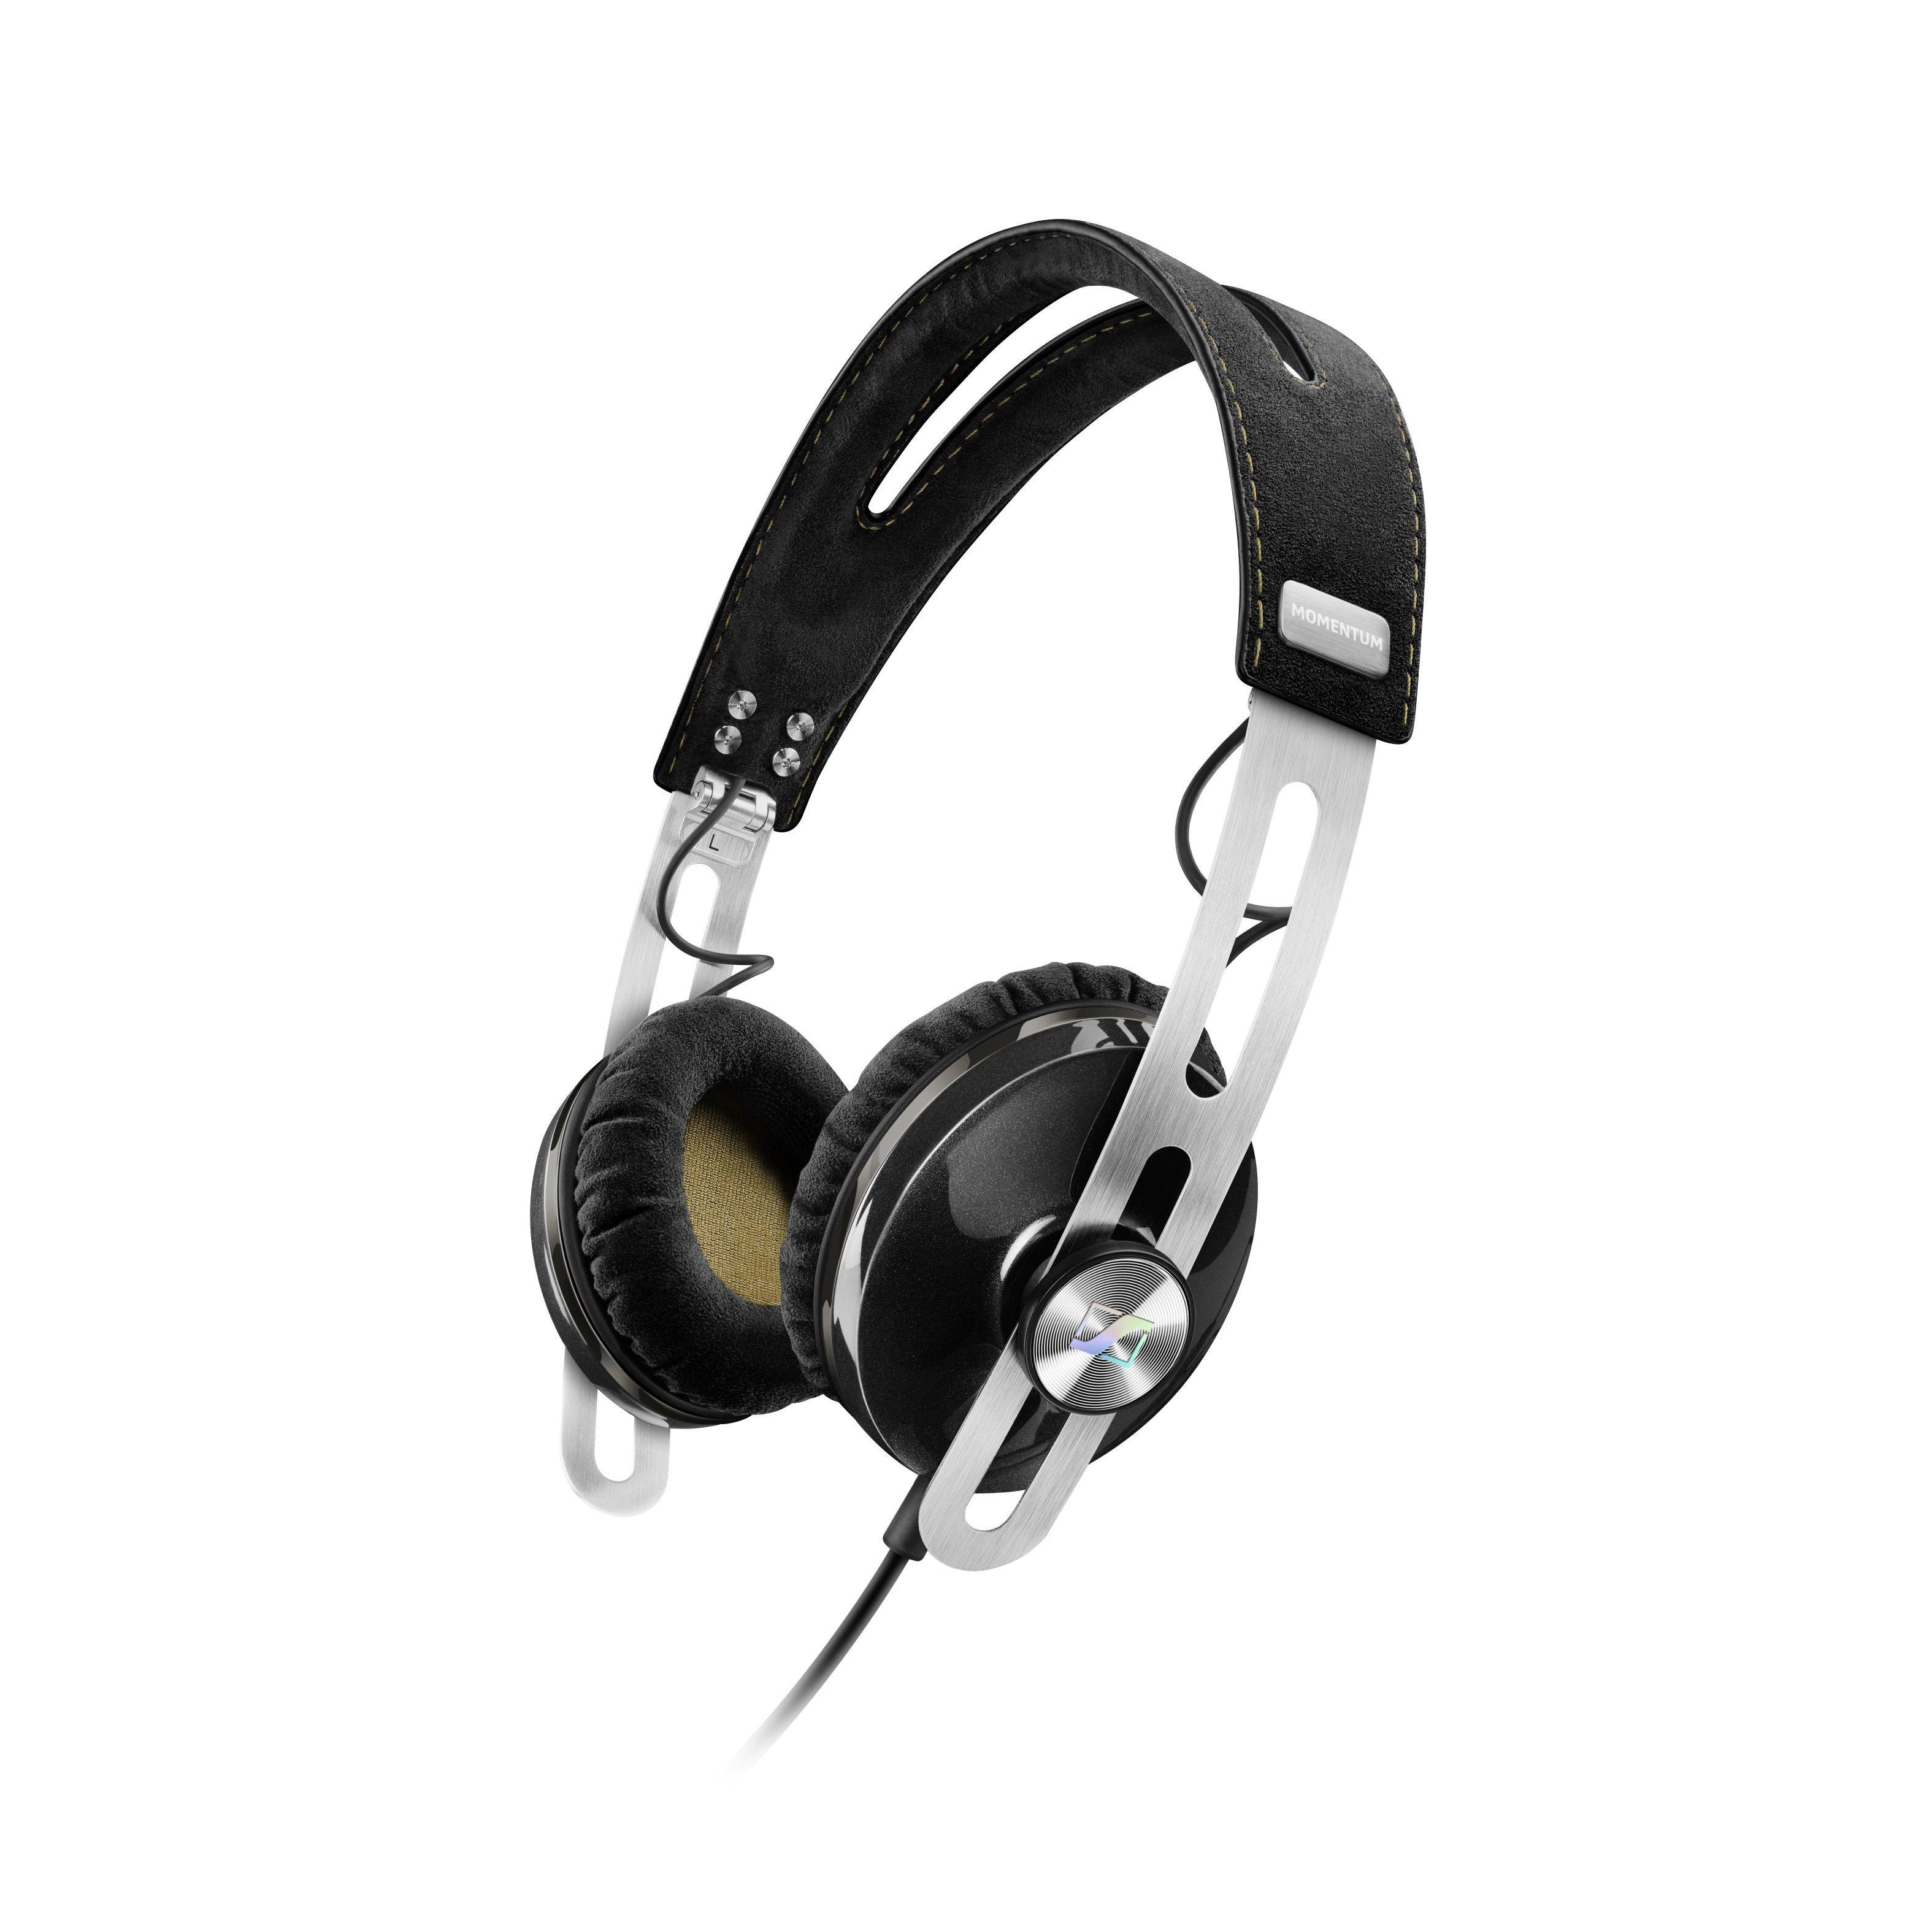 Sennheiser MOMENTUM On-Ear I Black (M2) cde9f9399a